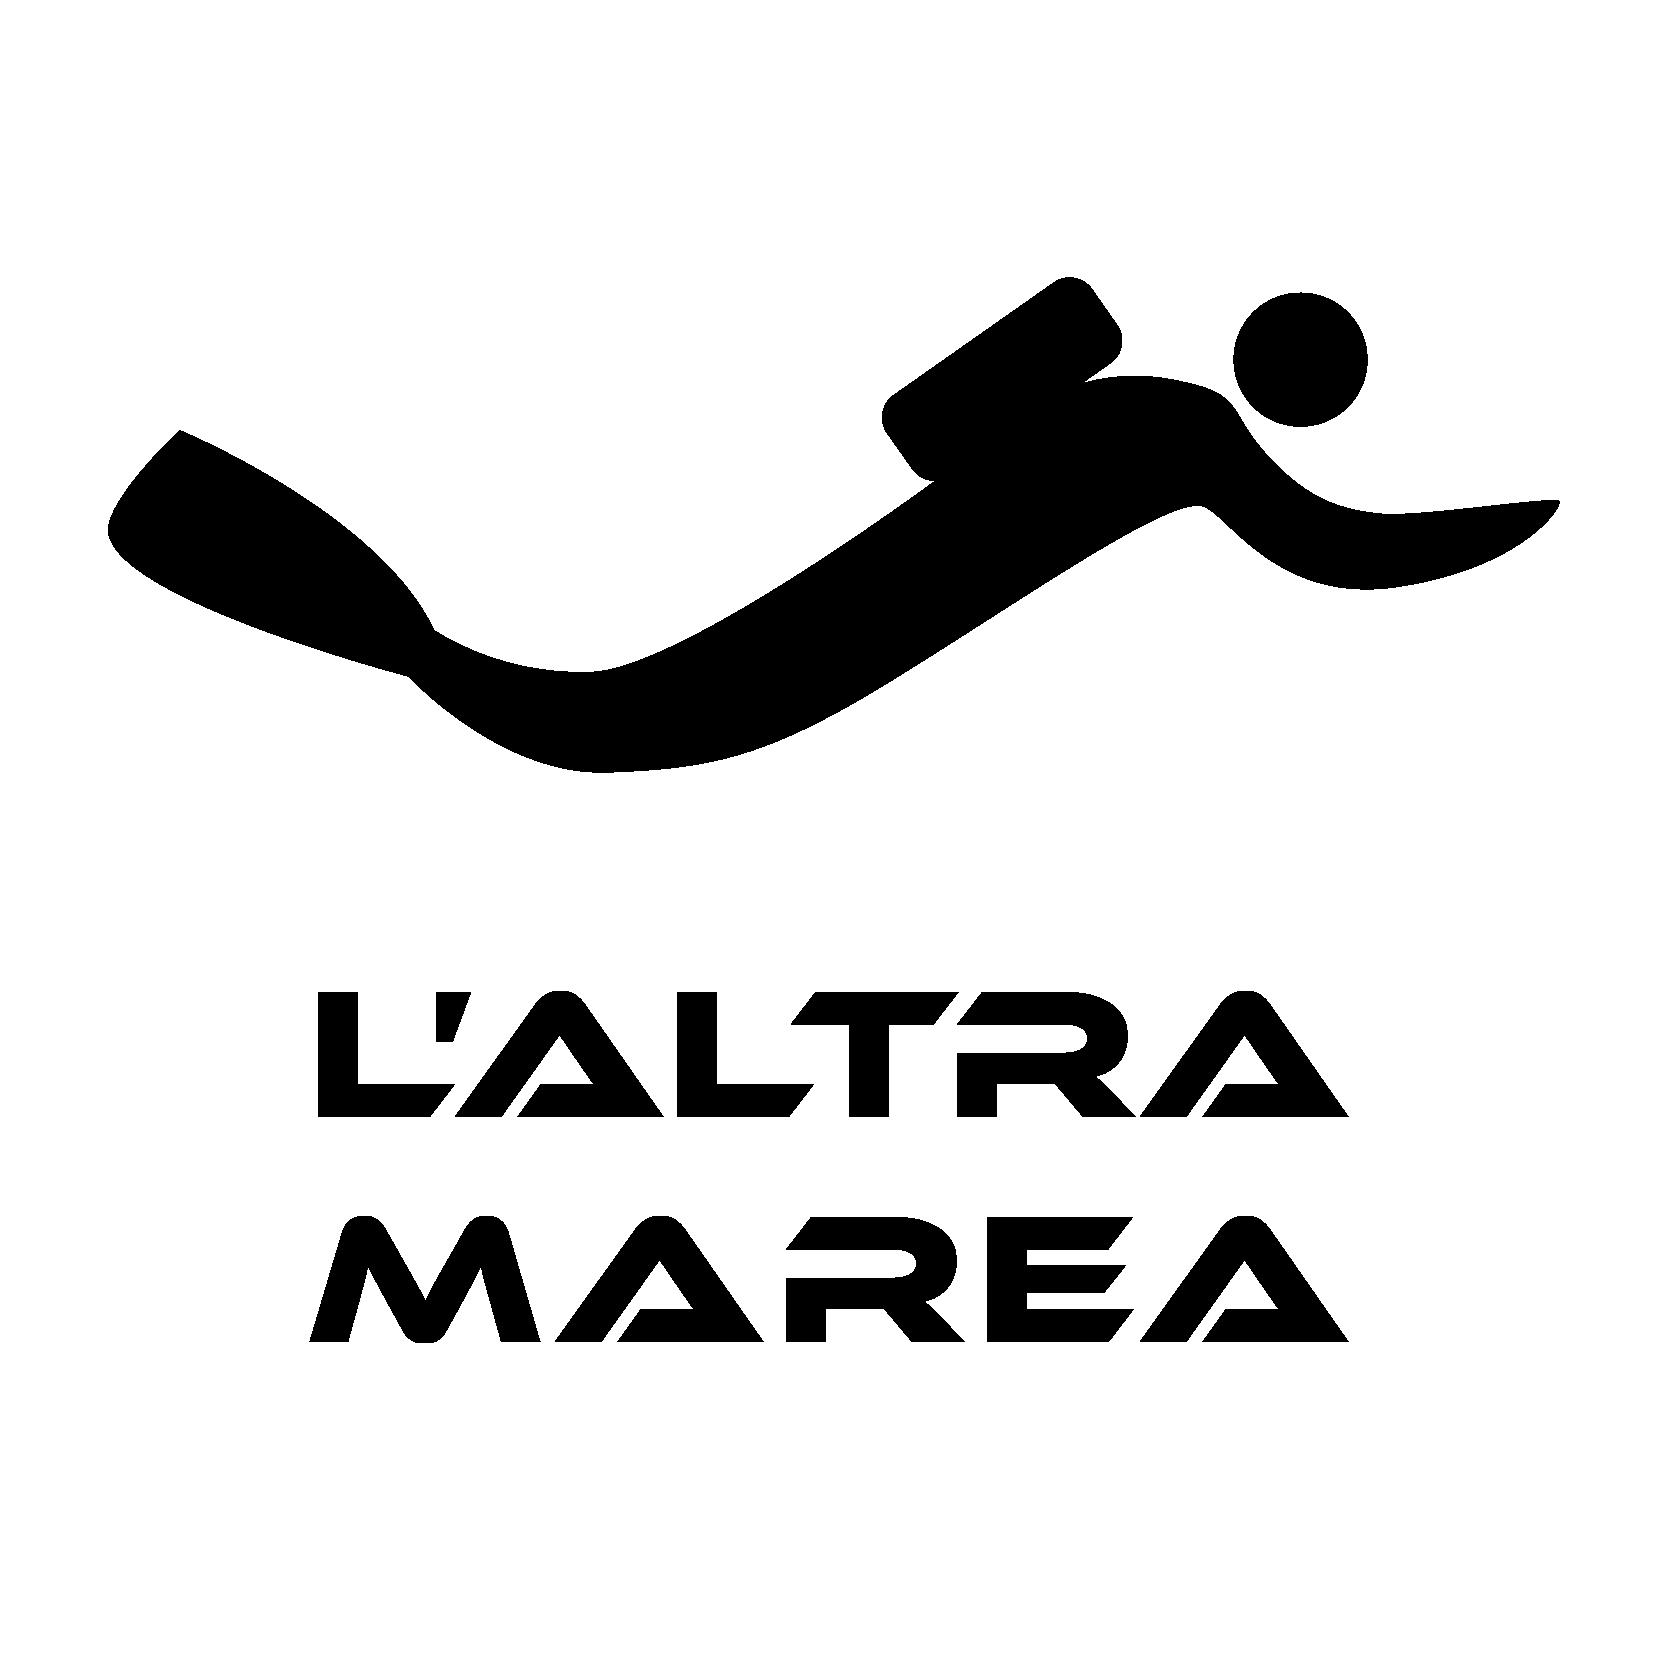 Logo L'altramarea